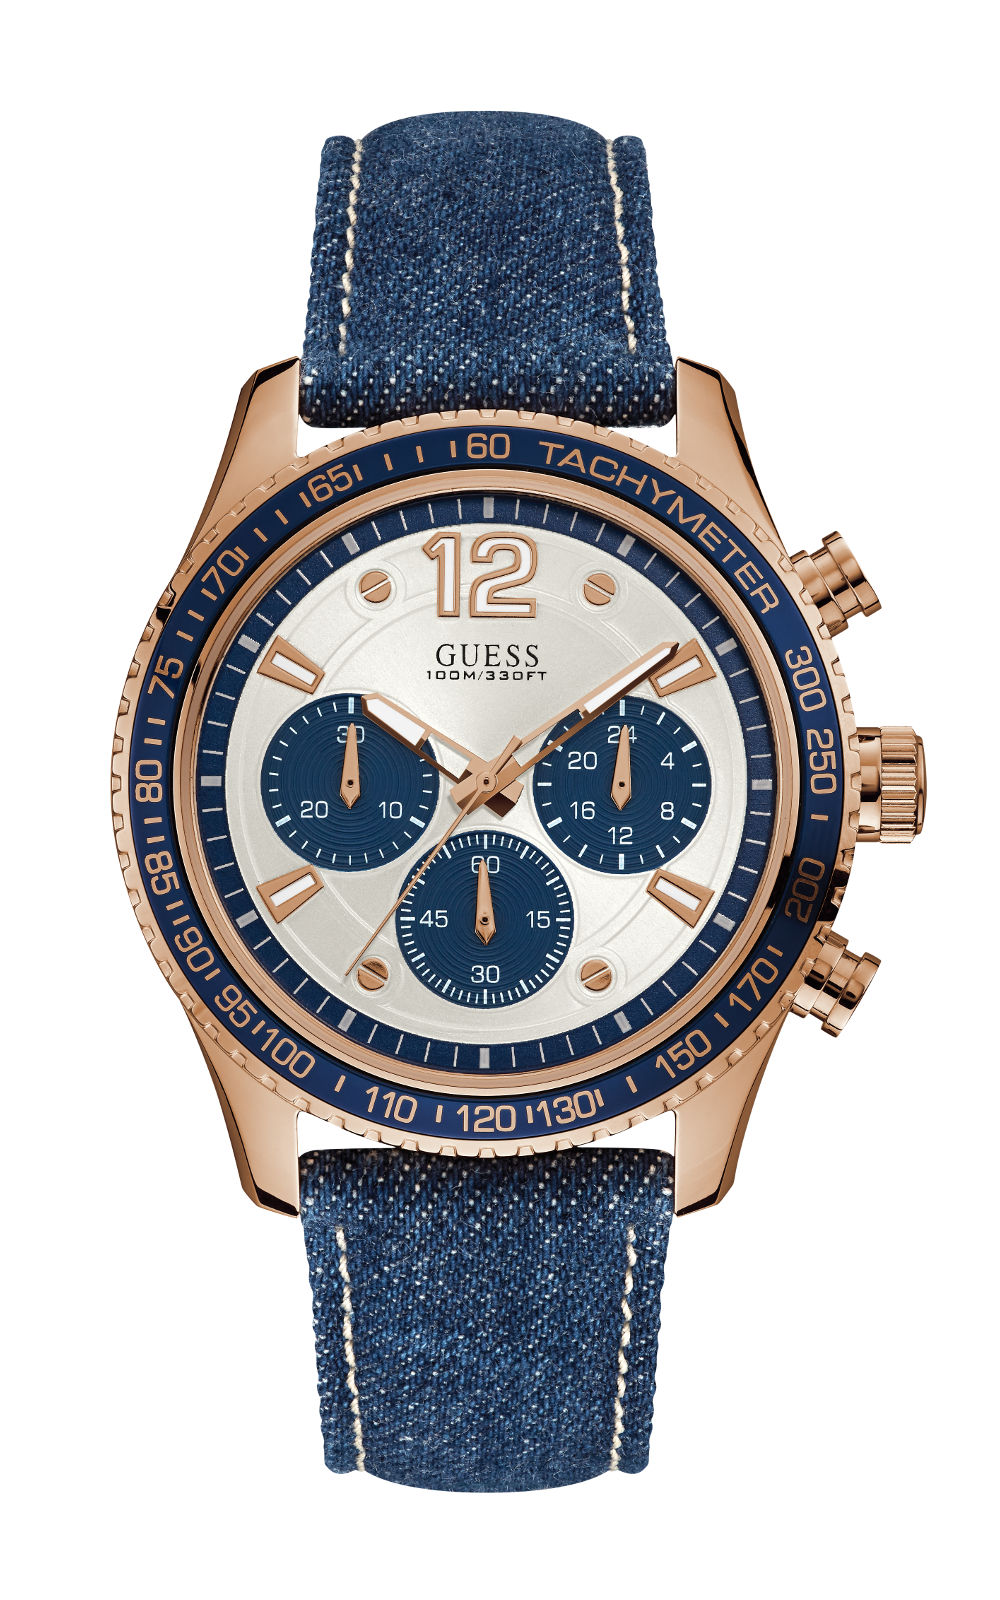 GUESS W0970G3 Ανδρικό Ρολόι Quartz Χρονογράφος Ακριβείας 92b55b5ebef